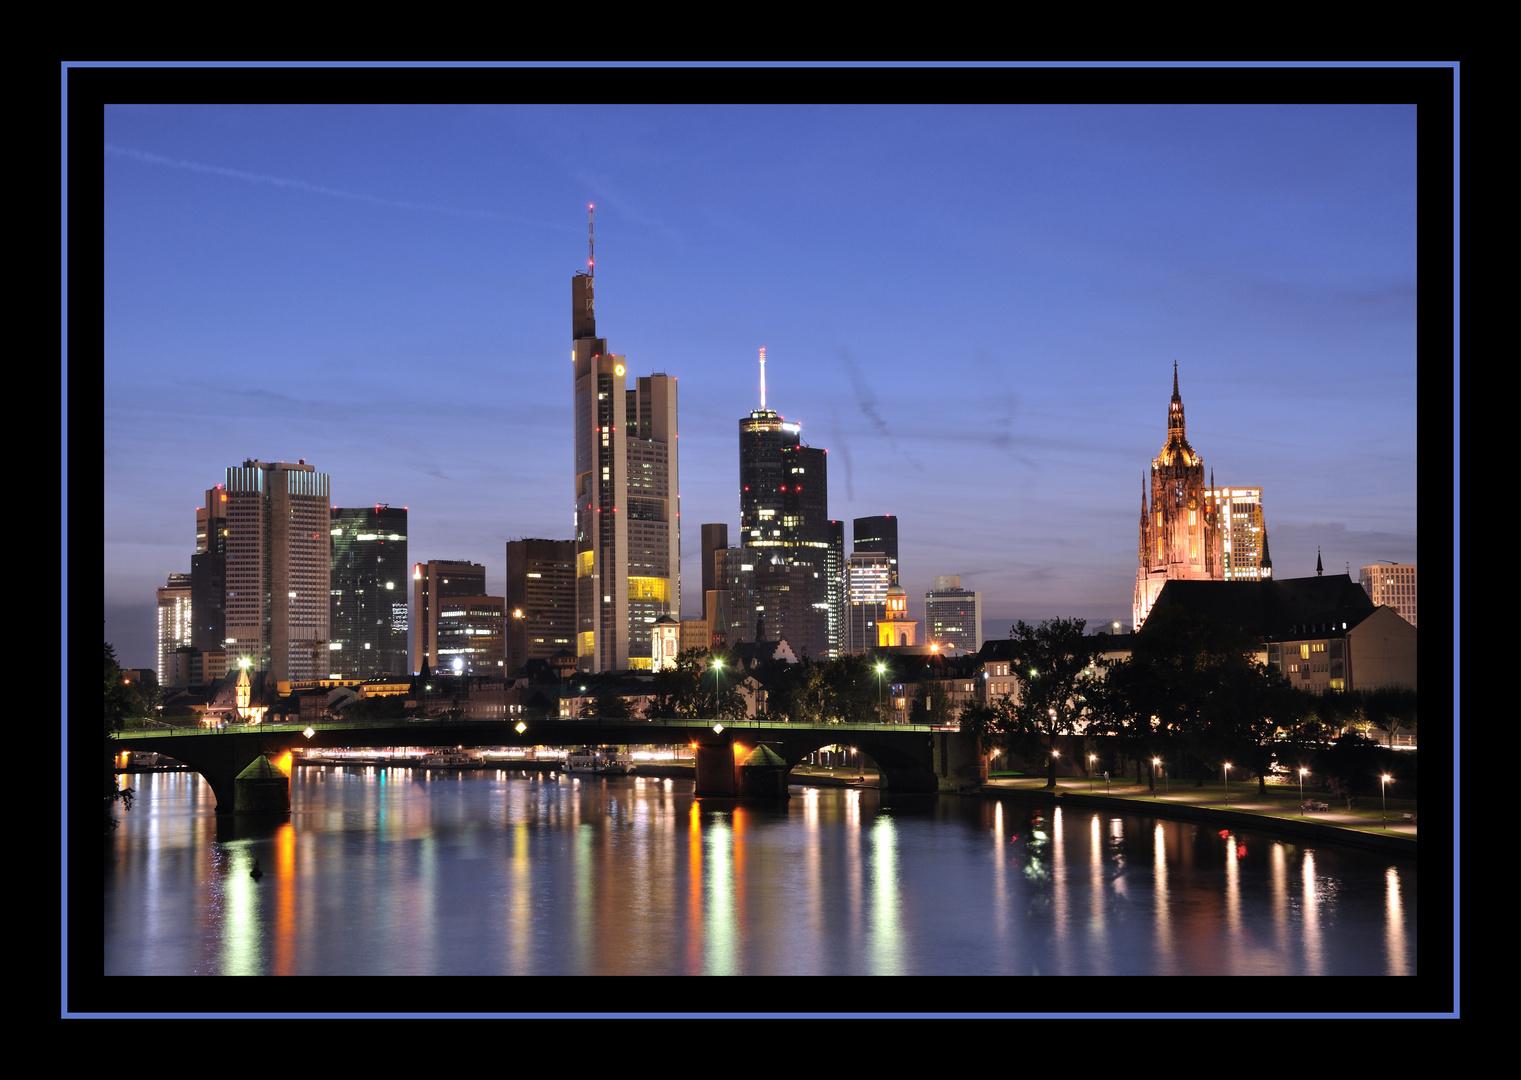 Frankfurt bei Nacht - Ignatz Bubis Brücke